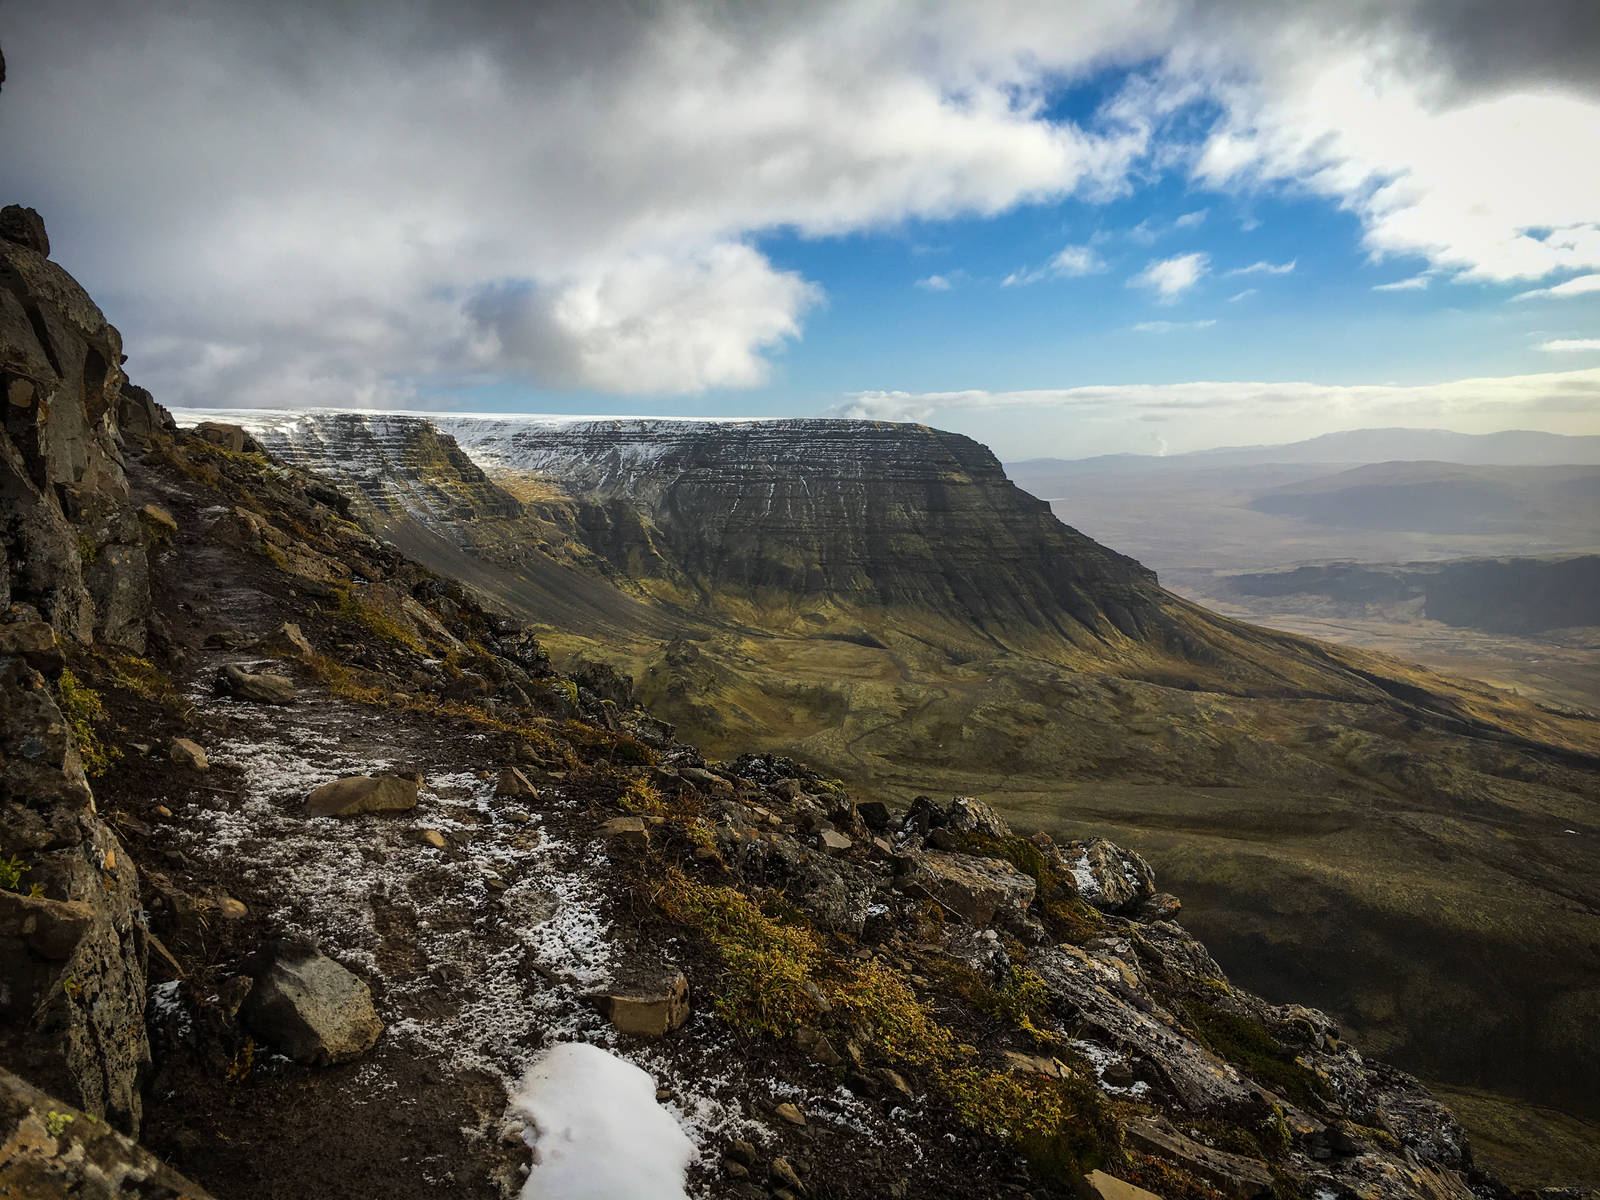 The view east from Þverfellshorn